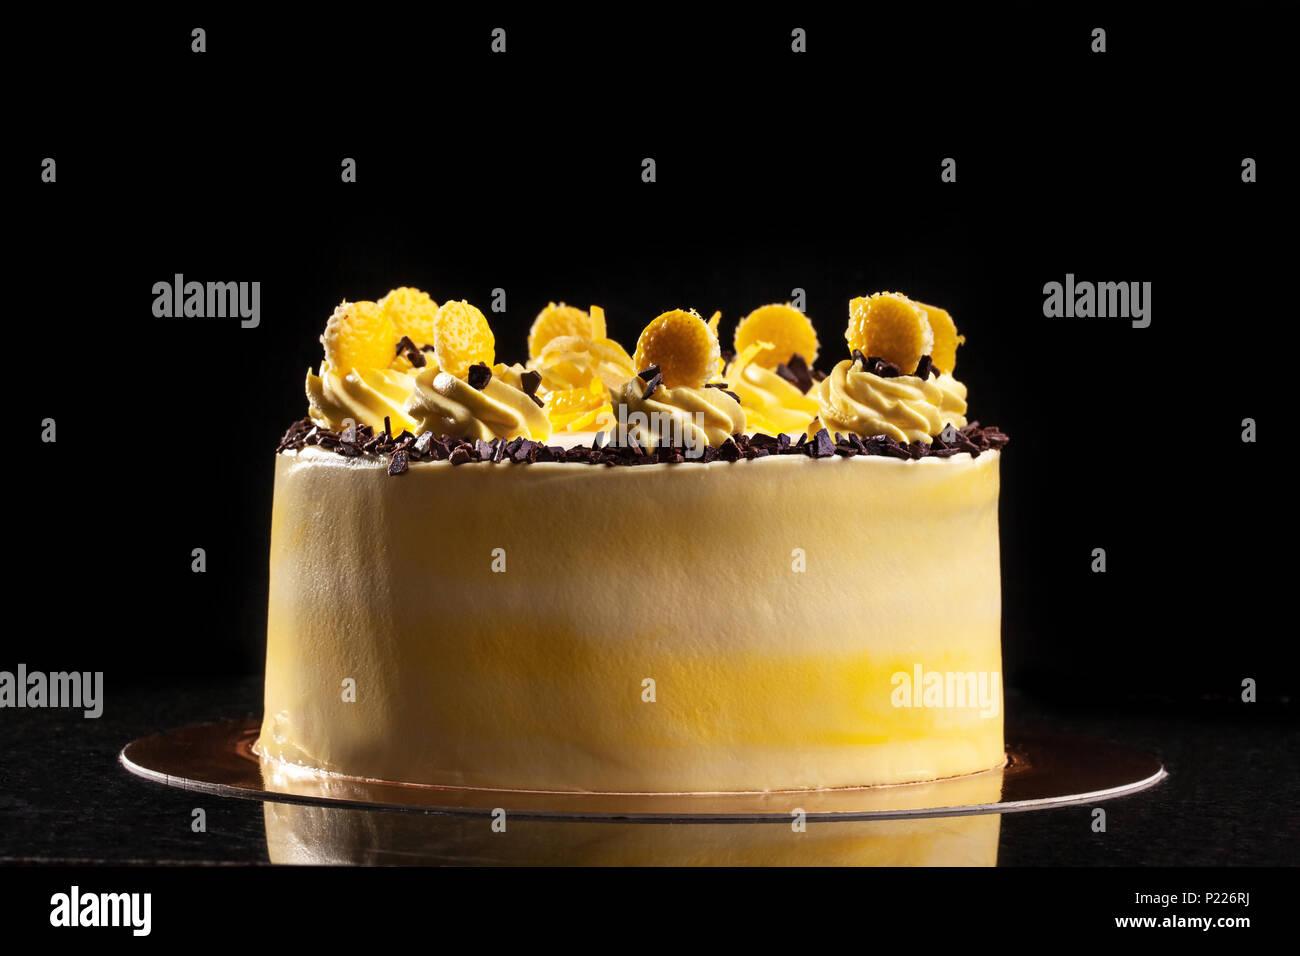 Round yellow birthday cake. Decorative cream decorations on the cake. Black background. - Stock Image